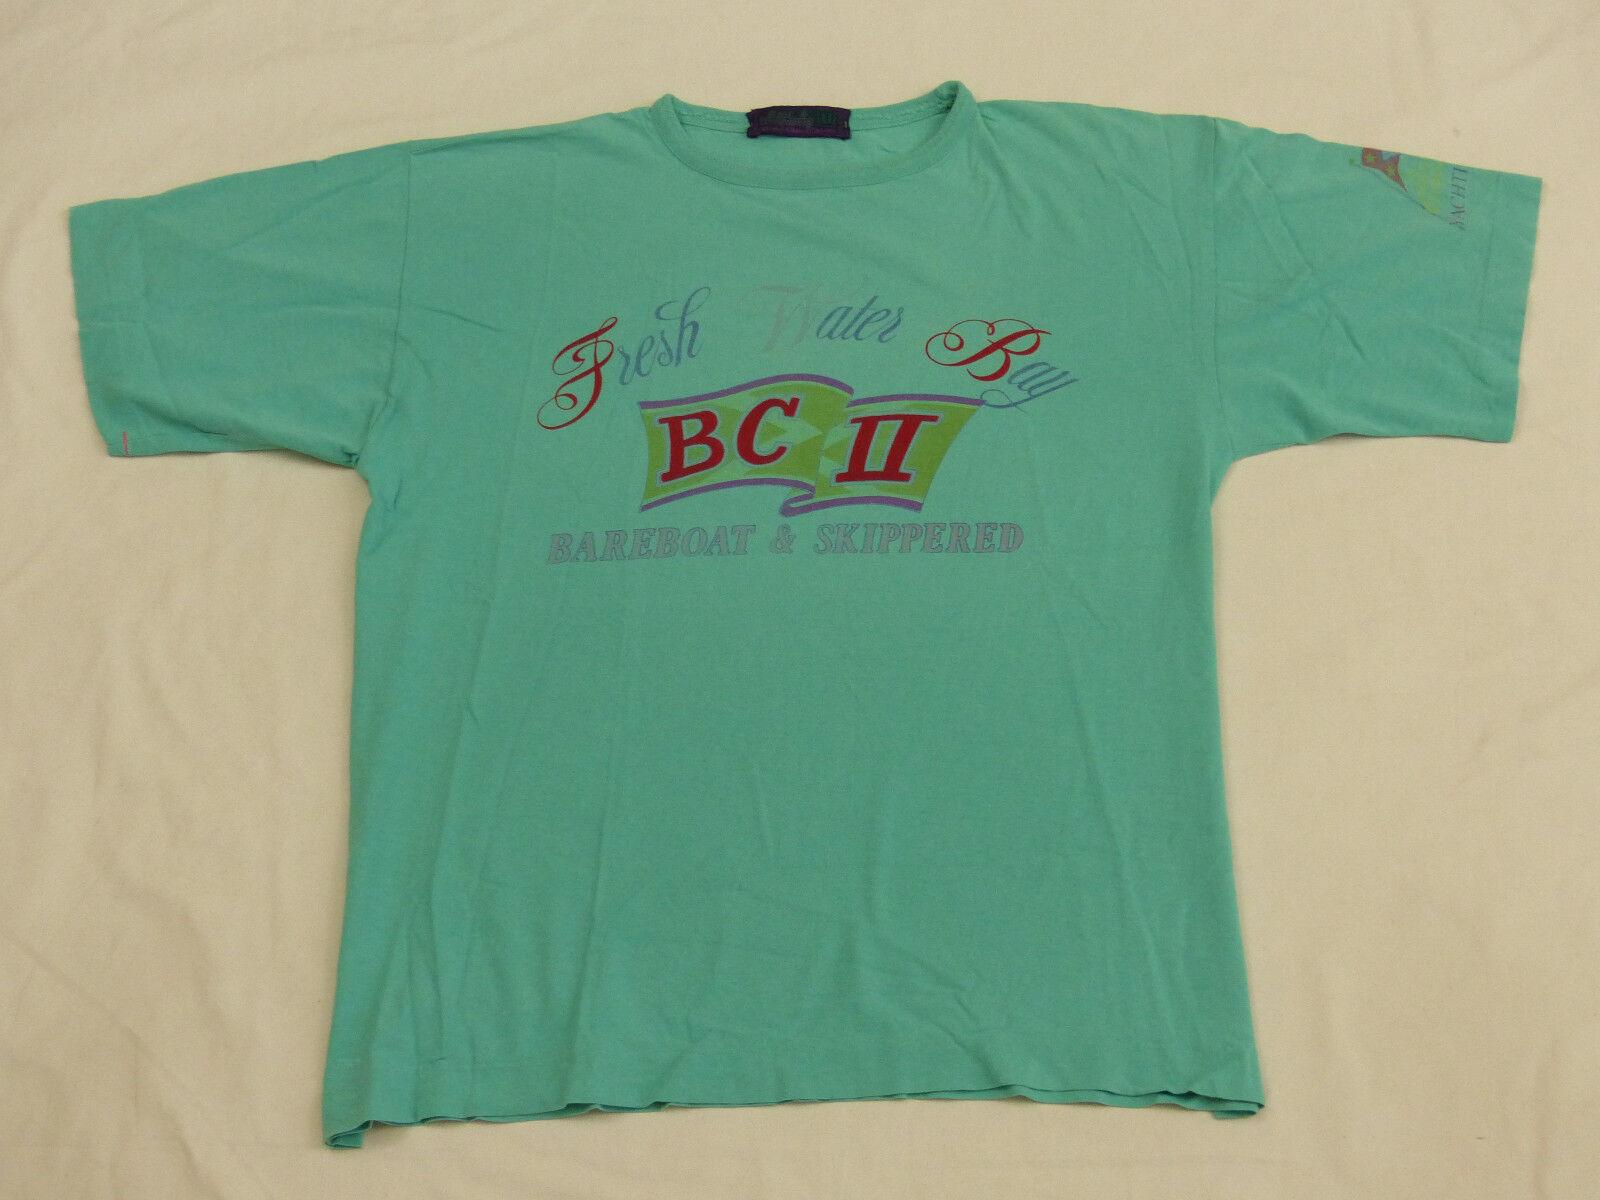 Best Company Casual T shirt     Fresh Water Bay noleggiatore skipperosso   Taglia: XL   rarità 41de07